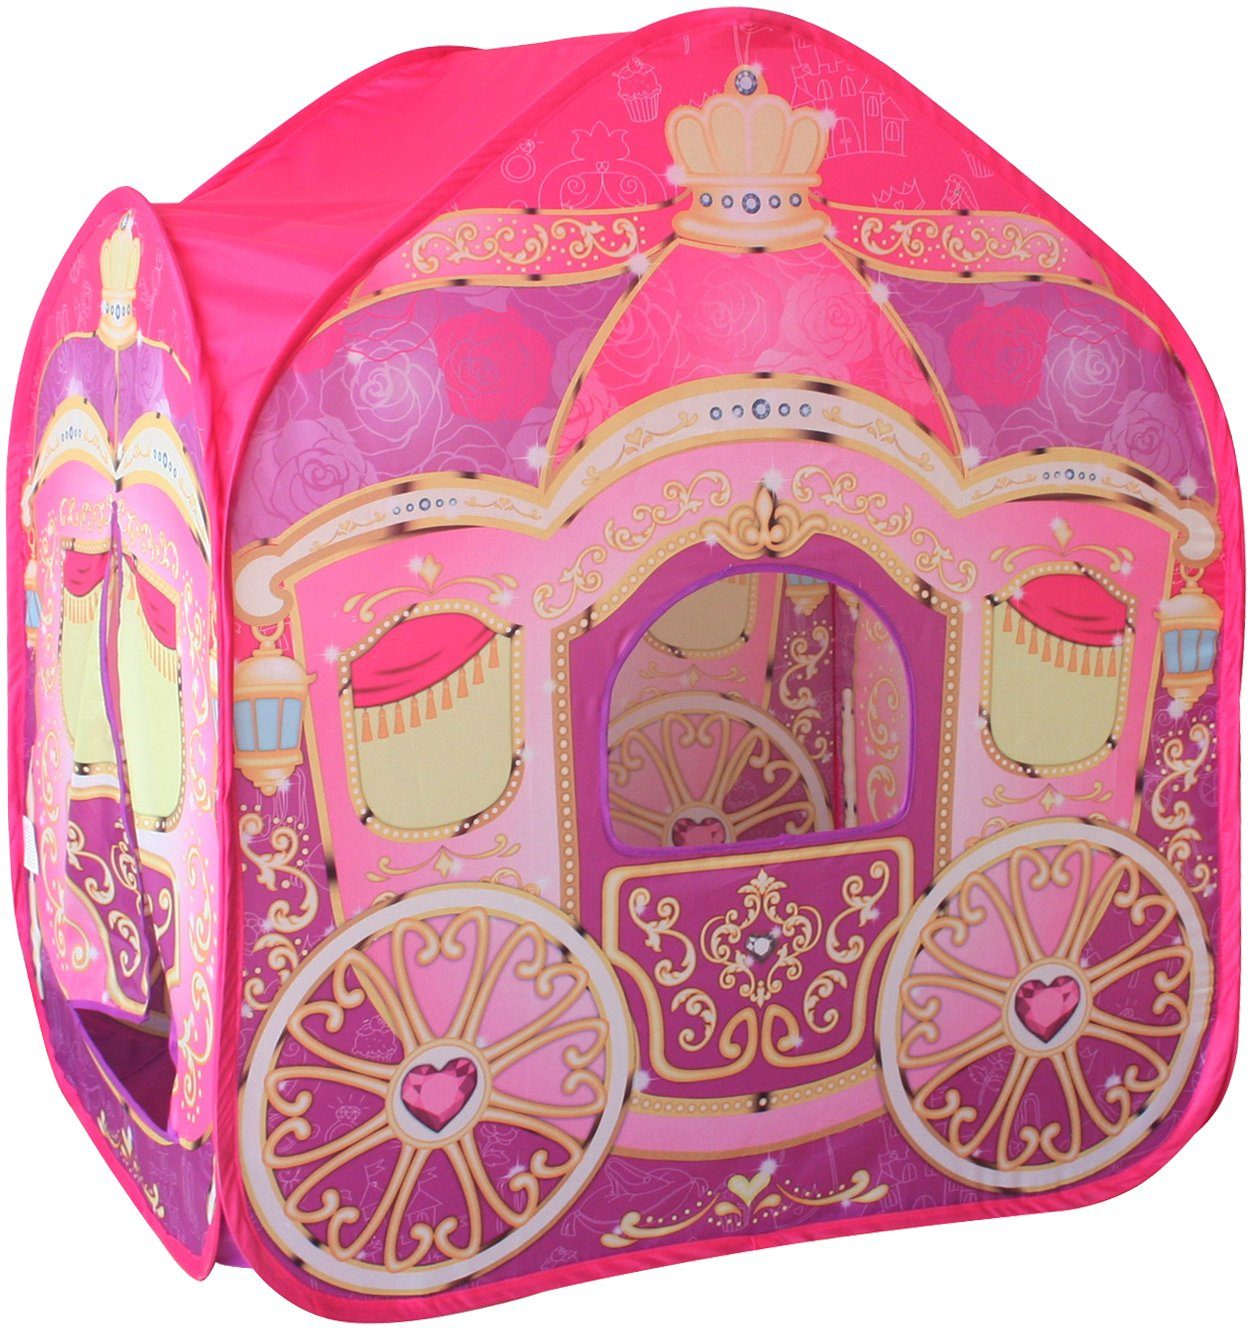 knorr toys Spielzelt Kutsche, »Princess Charlotte«